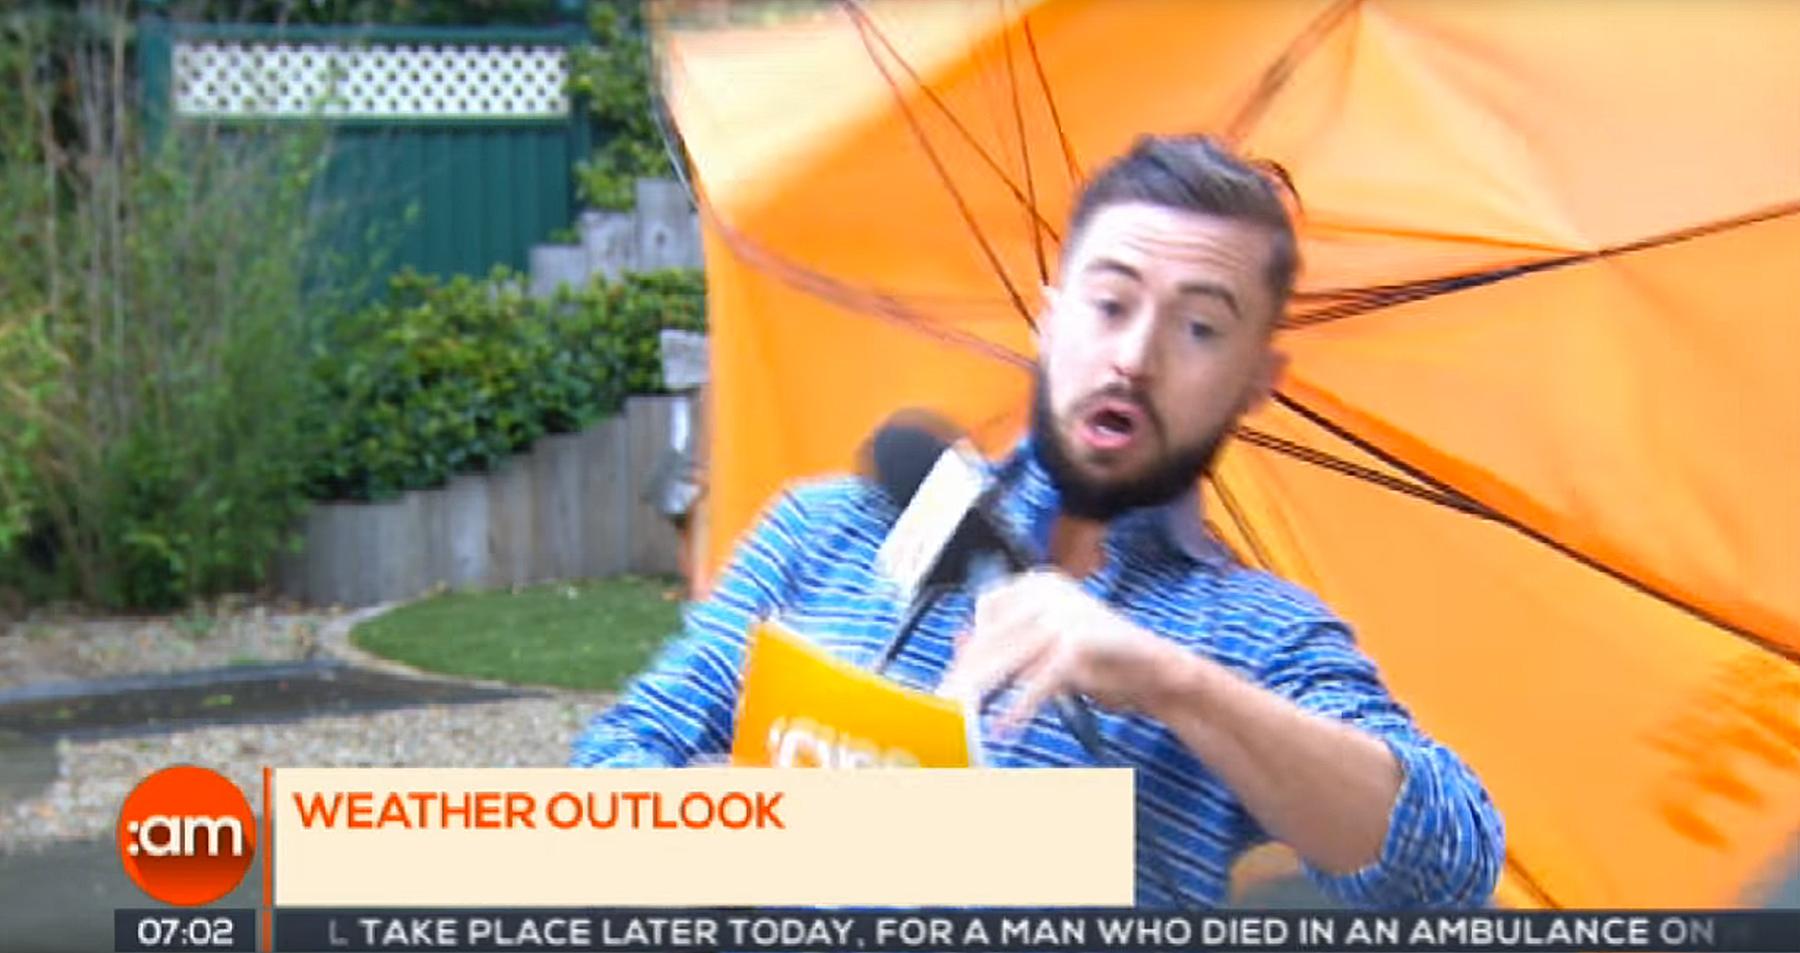 Irish weatherman Deric O h'Artagain